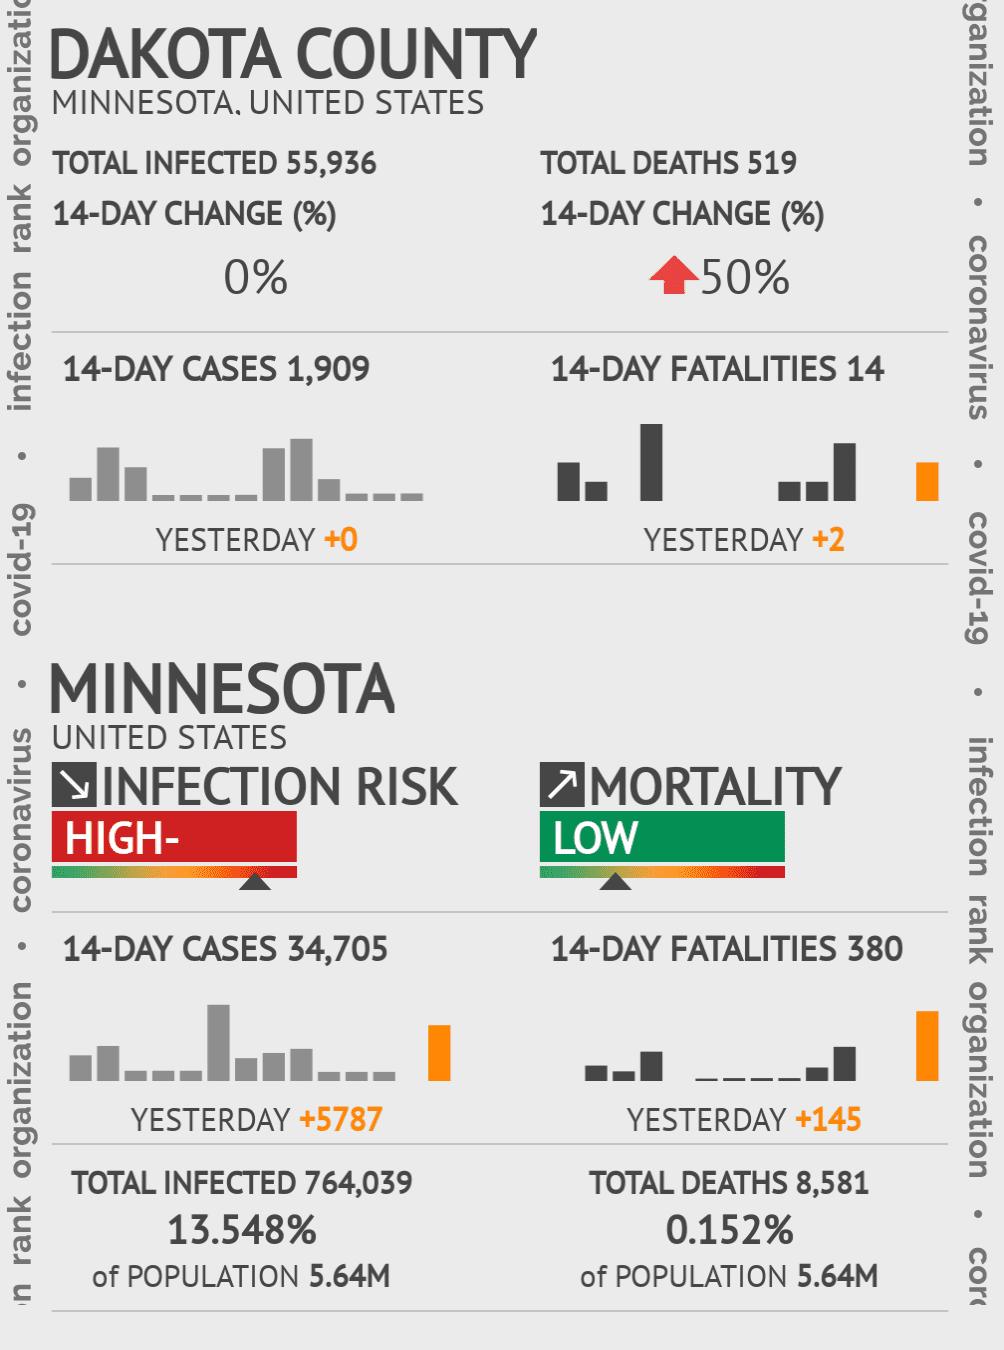 Dakota County Coronavirus Covid-19 Risk of Infection on July 24, 2021